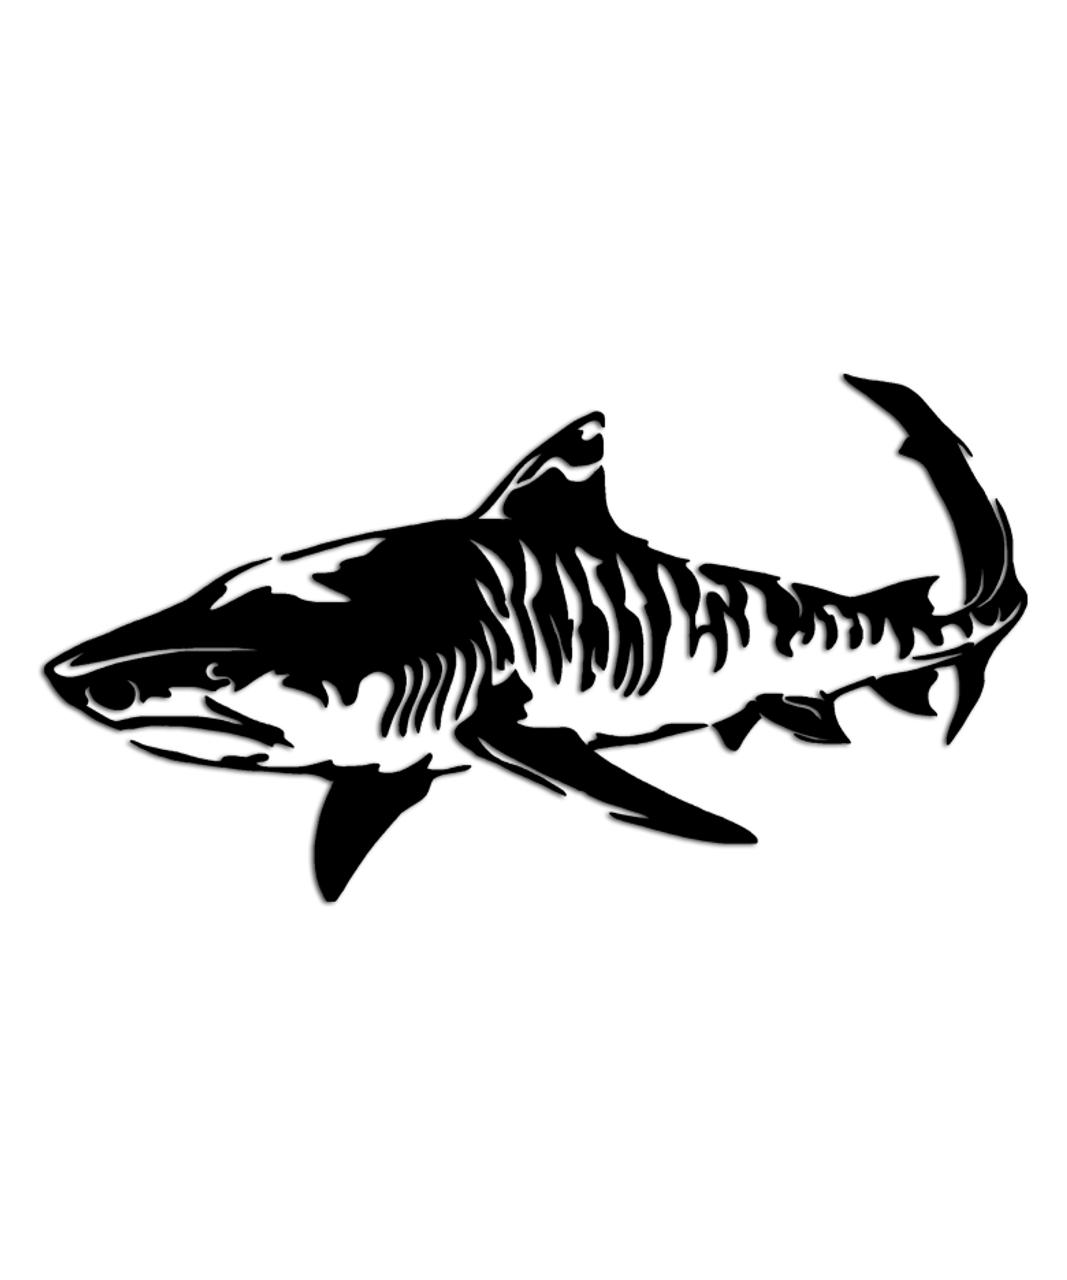 Tiger Shark Sticker Aftershock Decals